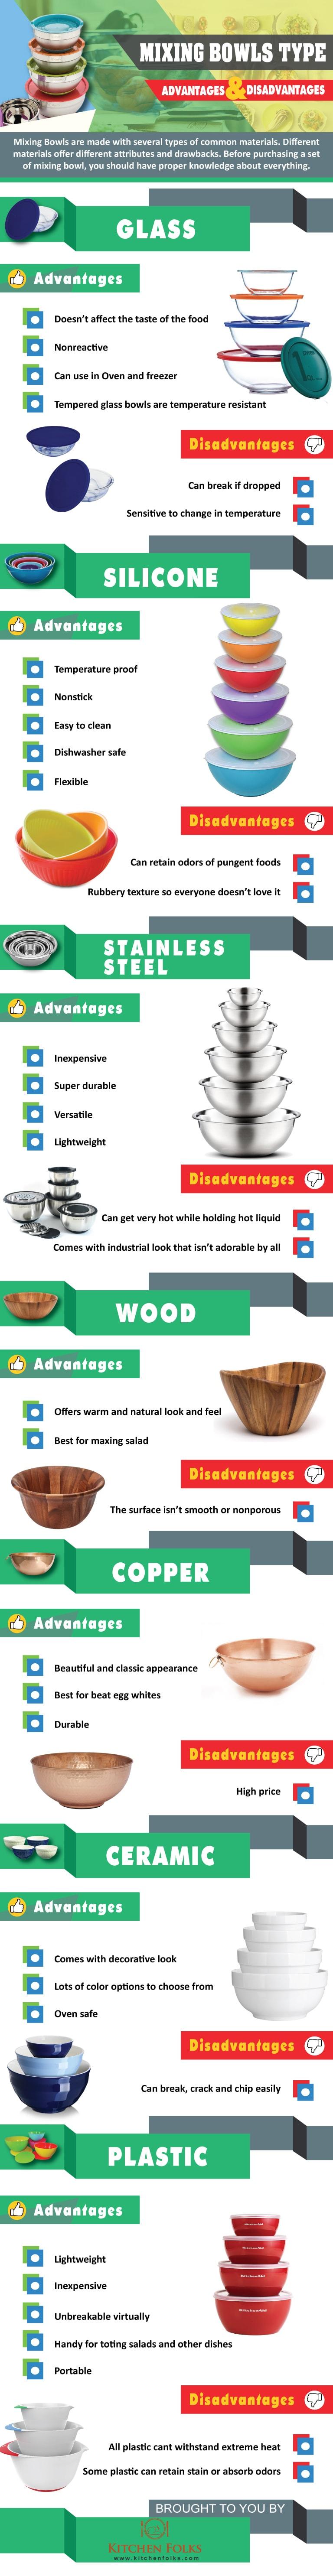 Mixing-Bowl-Advantages-and-Disadvantages